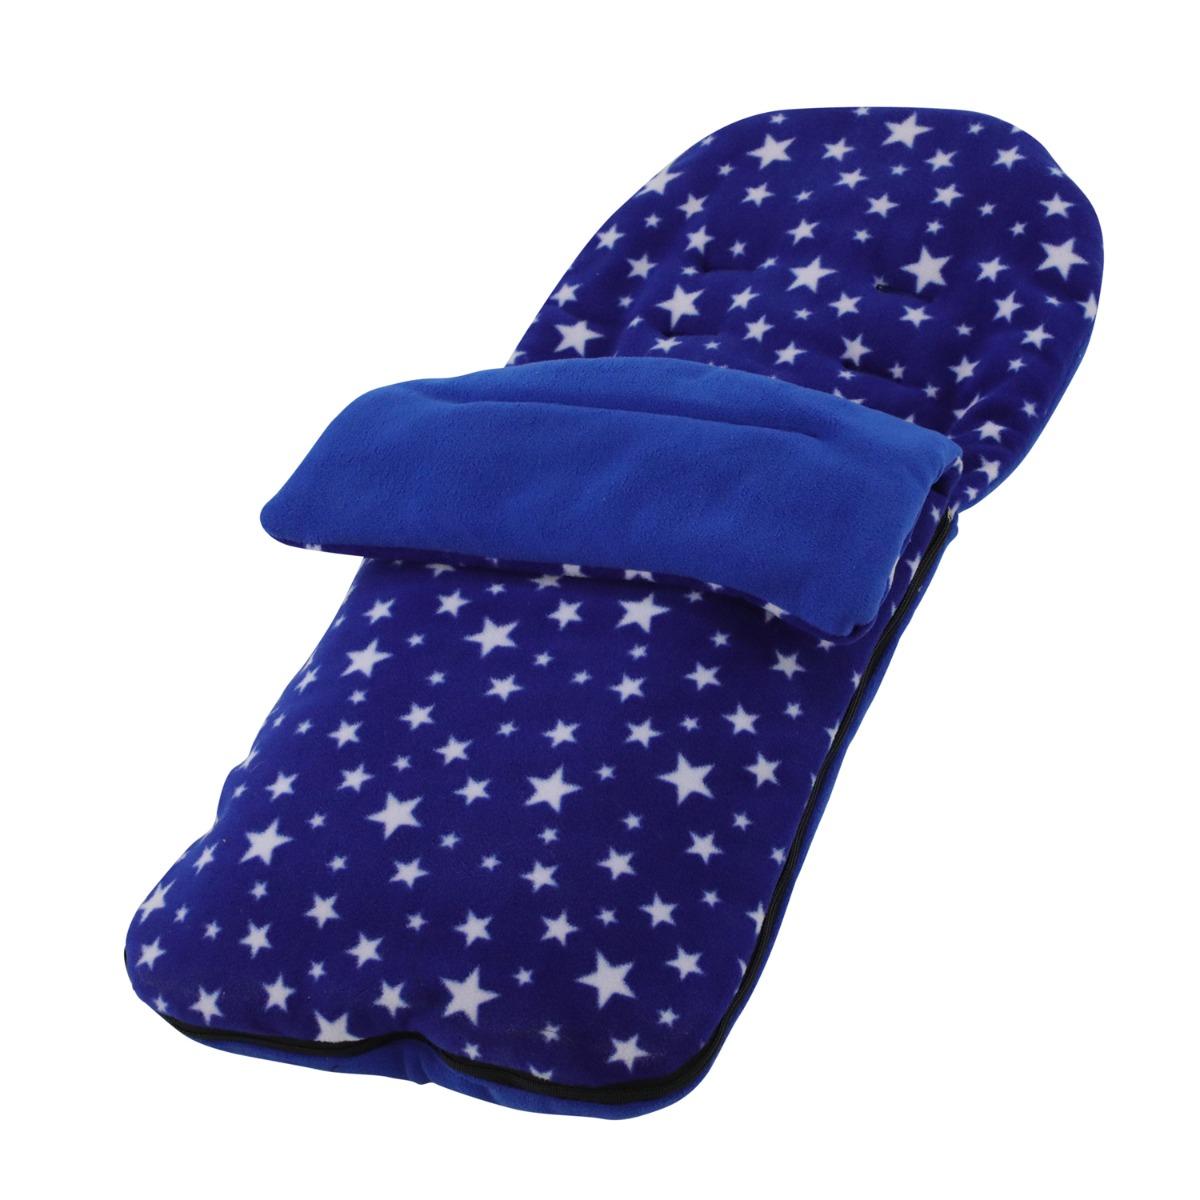 Snuggle-Summer-Pushchair-Footmuff-Pram-Buggy-Stroller-Deluxe thumbnail 14